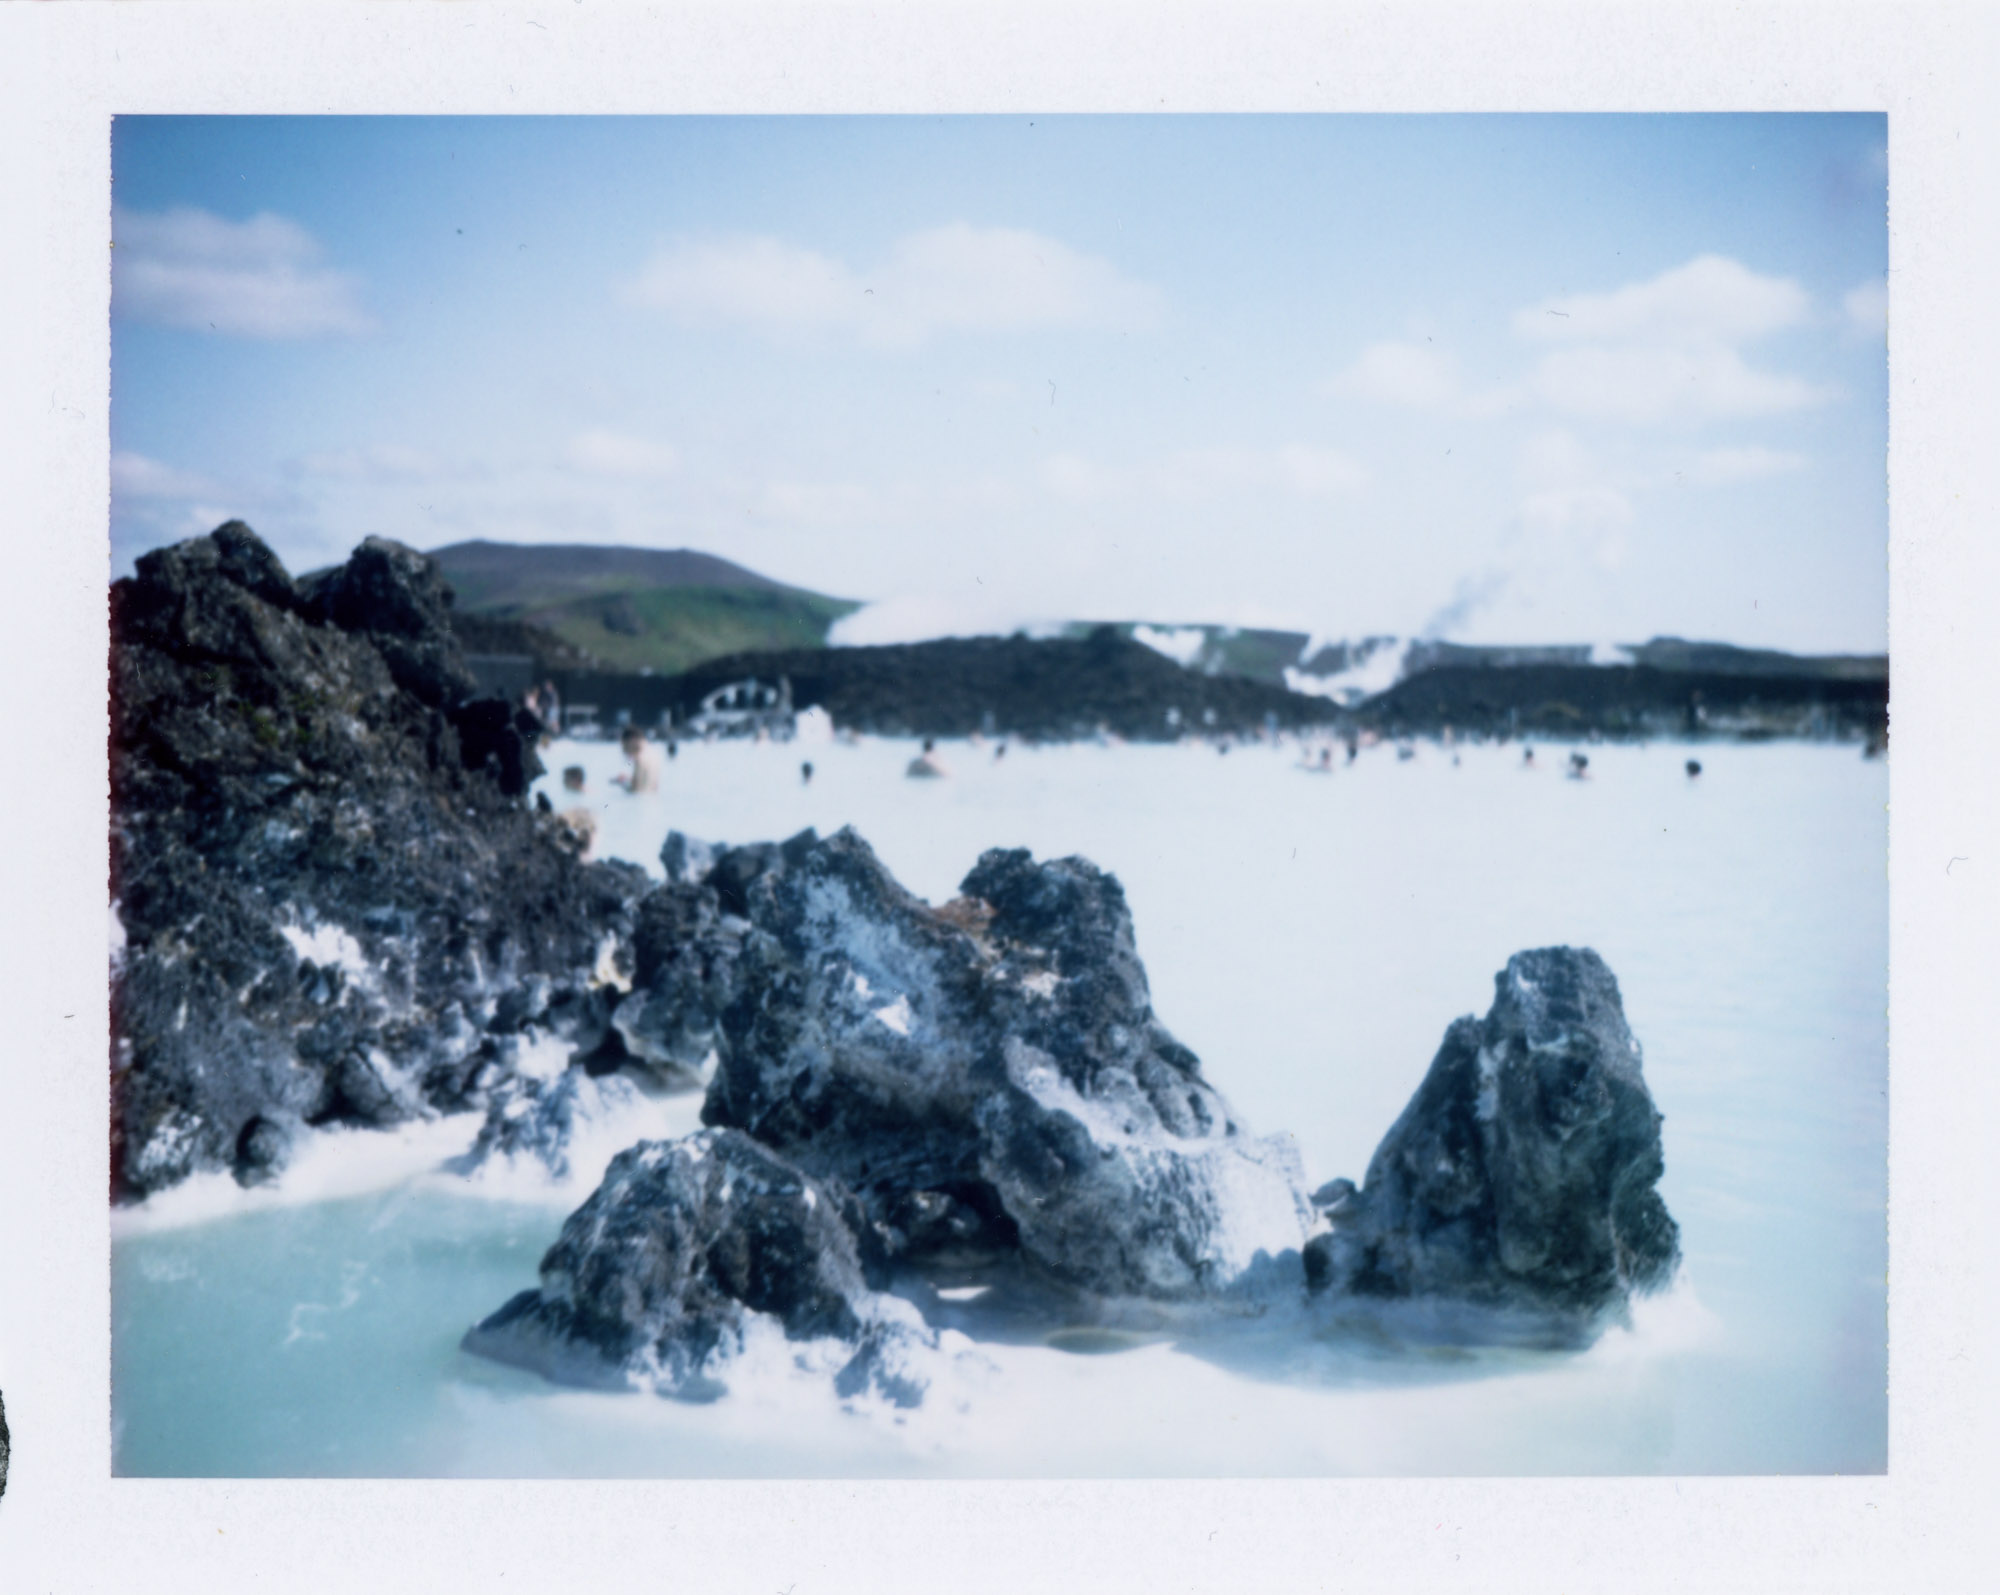 Iceland_Polaroid_017_final_web.jpg